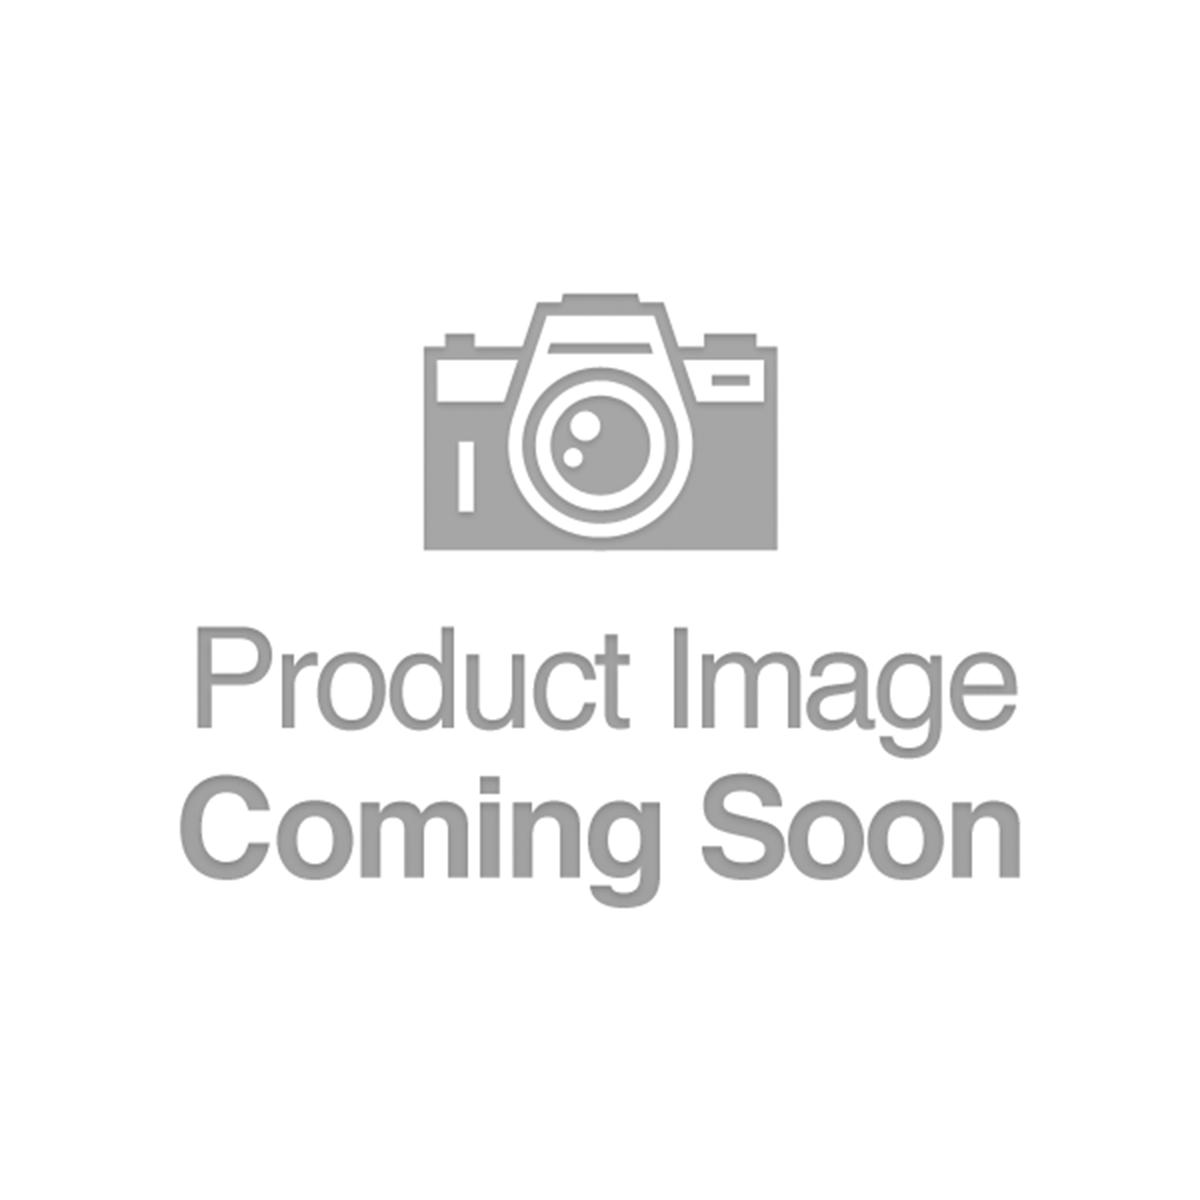 FR 275 $5 1899 Silver Certificate PMG 65 EPQ